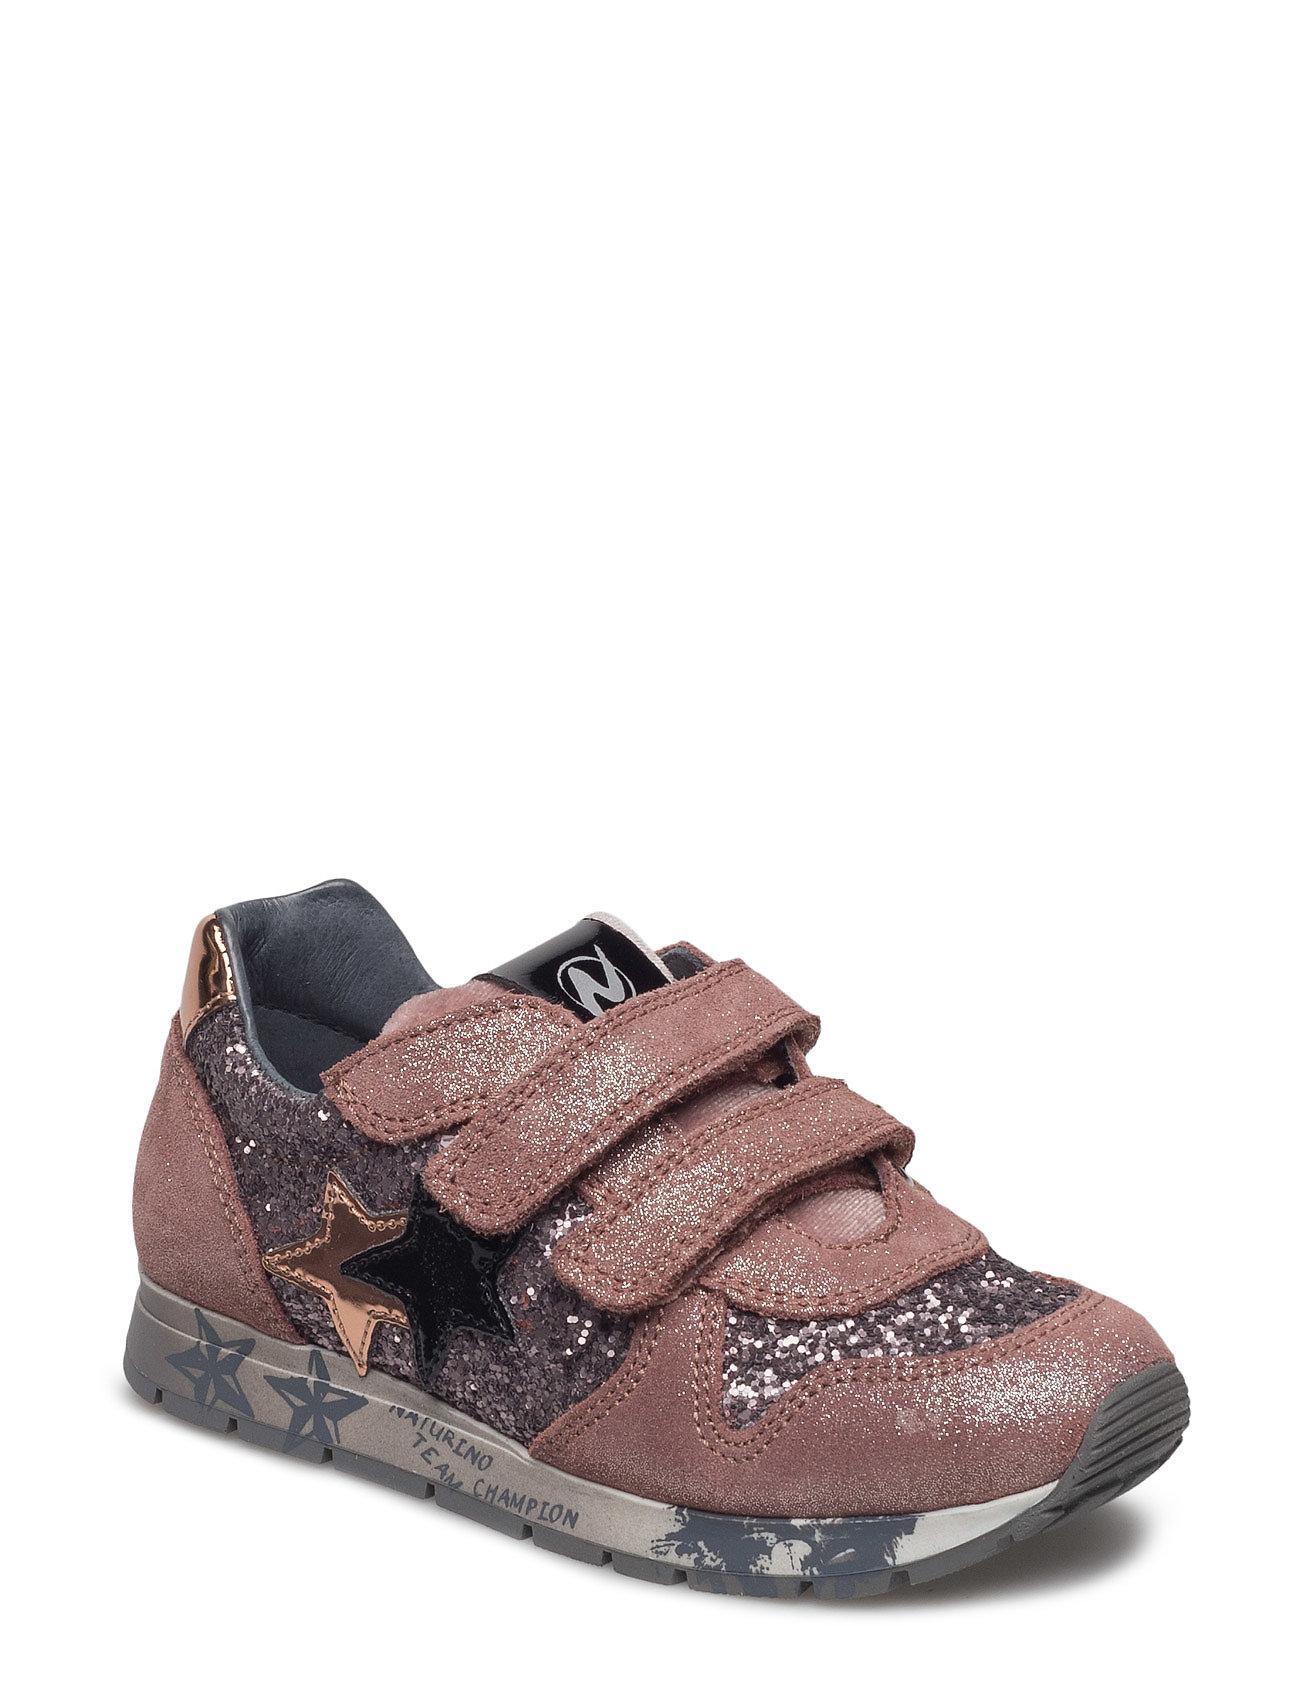 Naturino Parker Vl Naturino Sko & Sneakers til Børn i Rosa